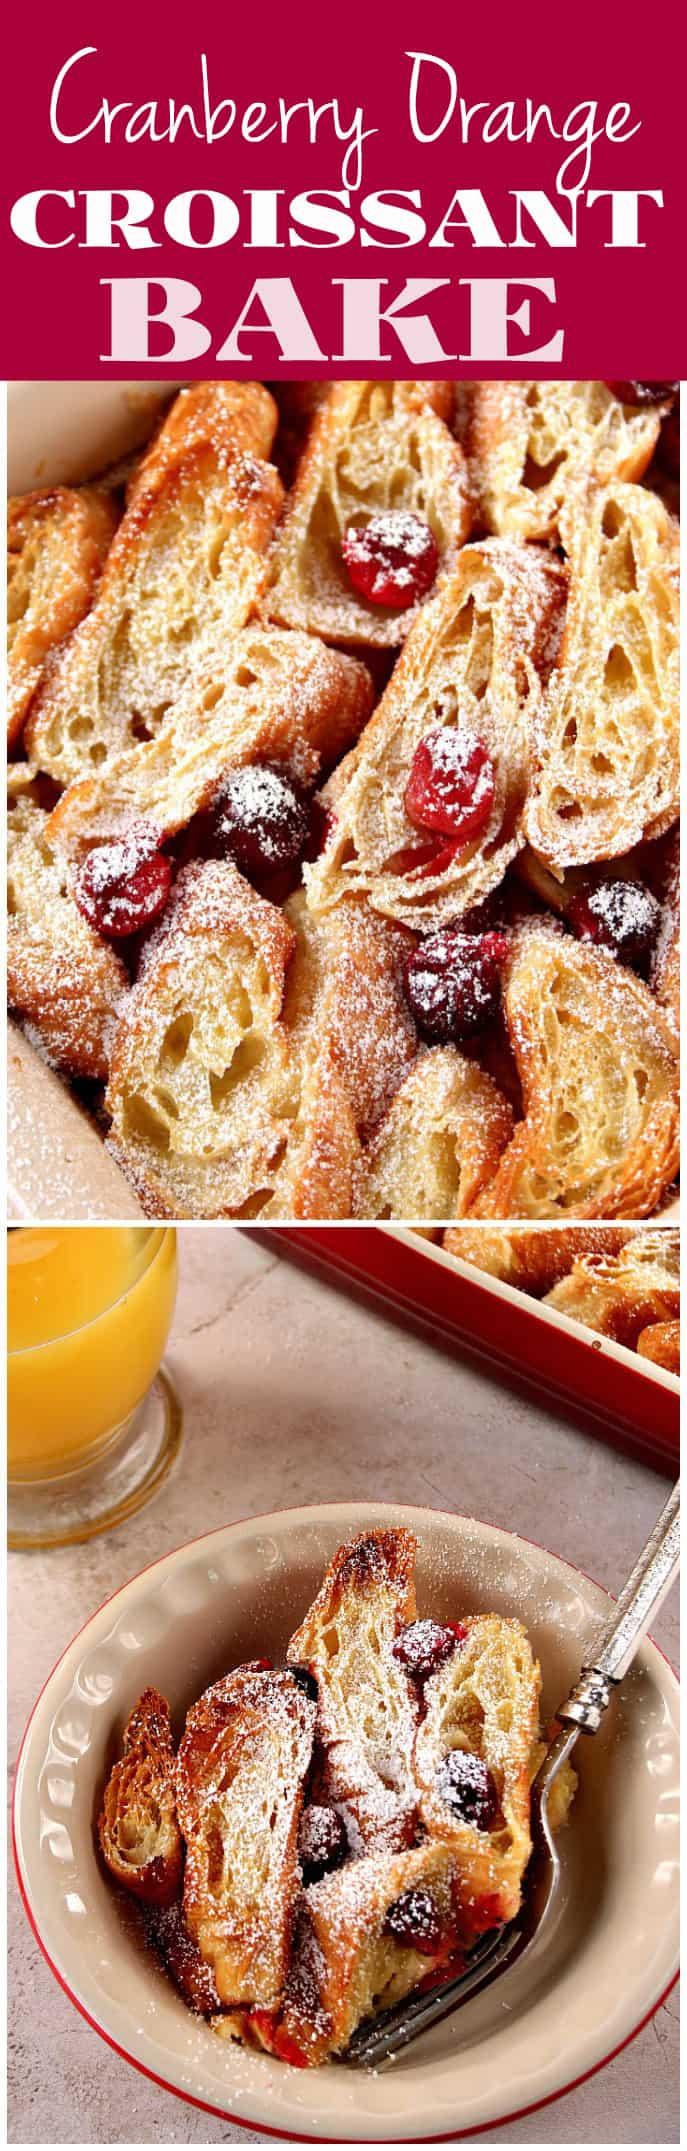 cranberry orange croissant bake recipe long1 Orange Cranberry Croissant Bake Recipe